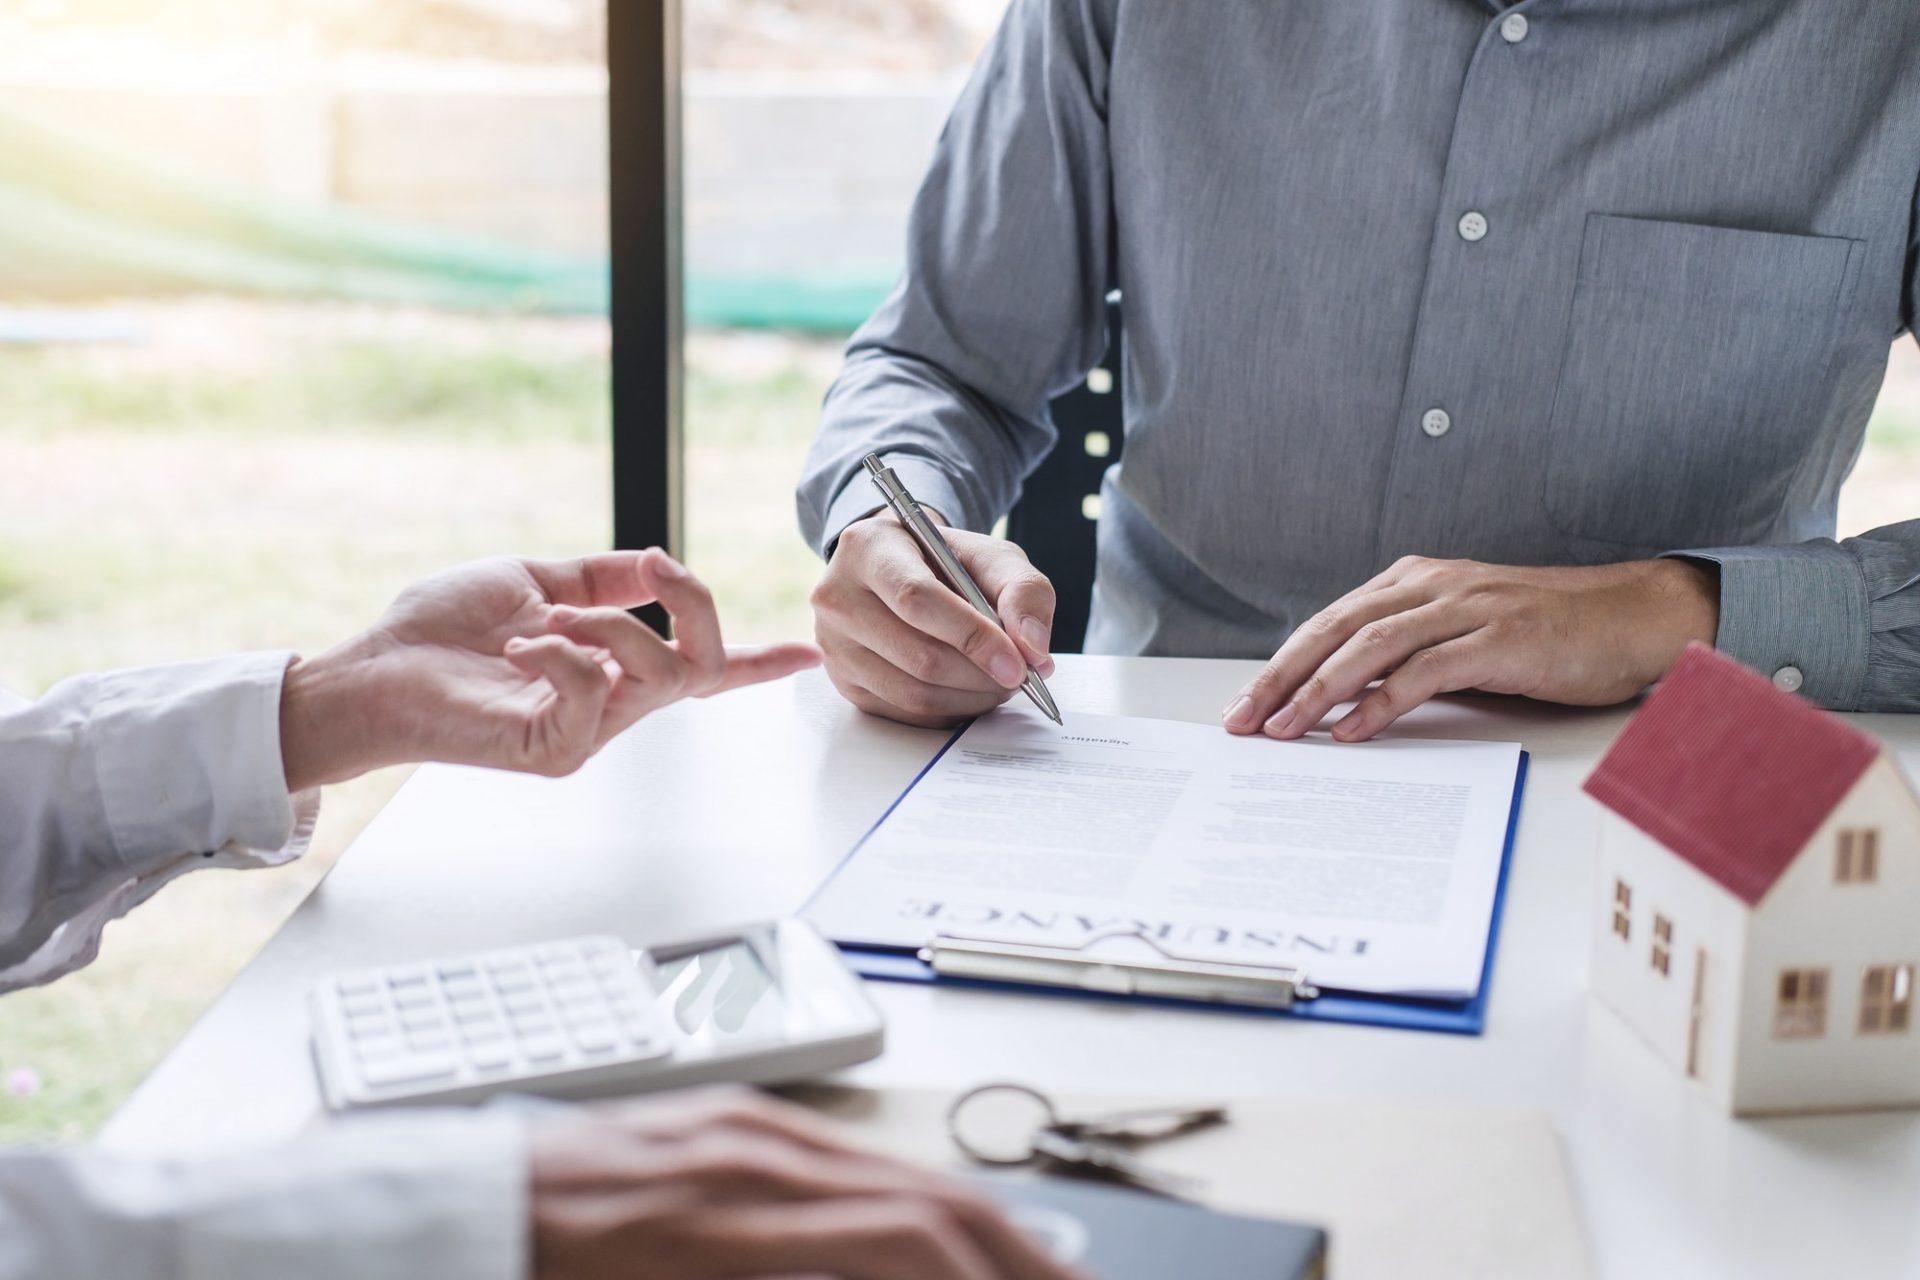 6 Tips for Saving on Home Insurance